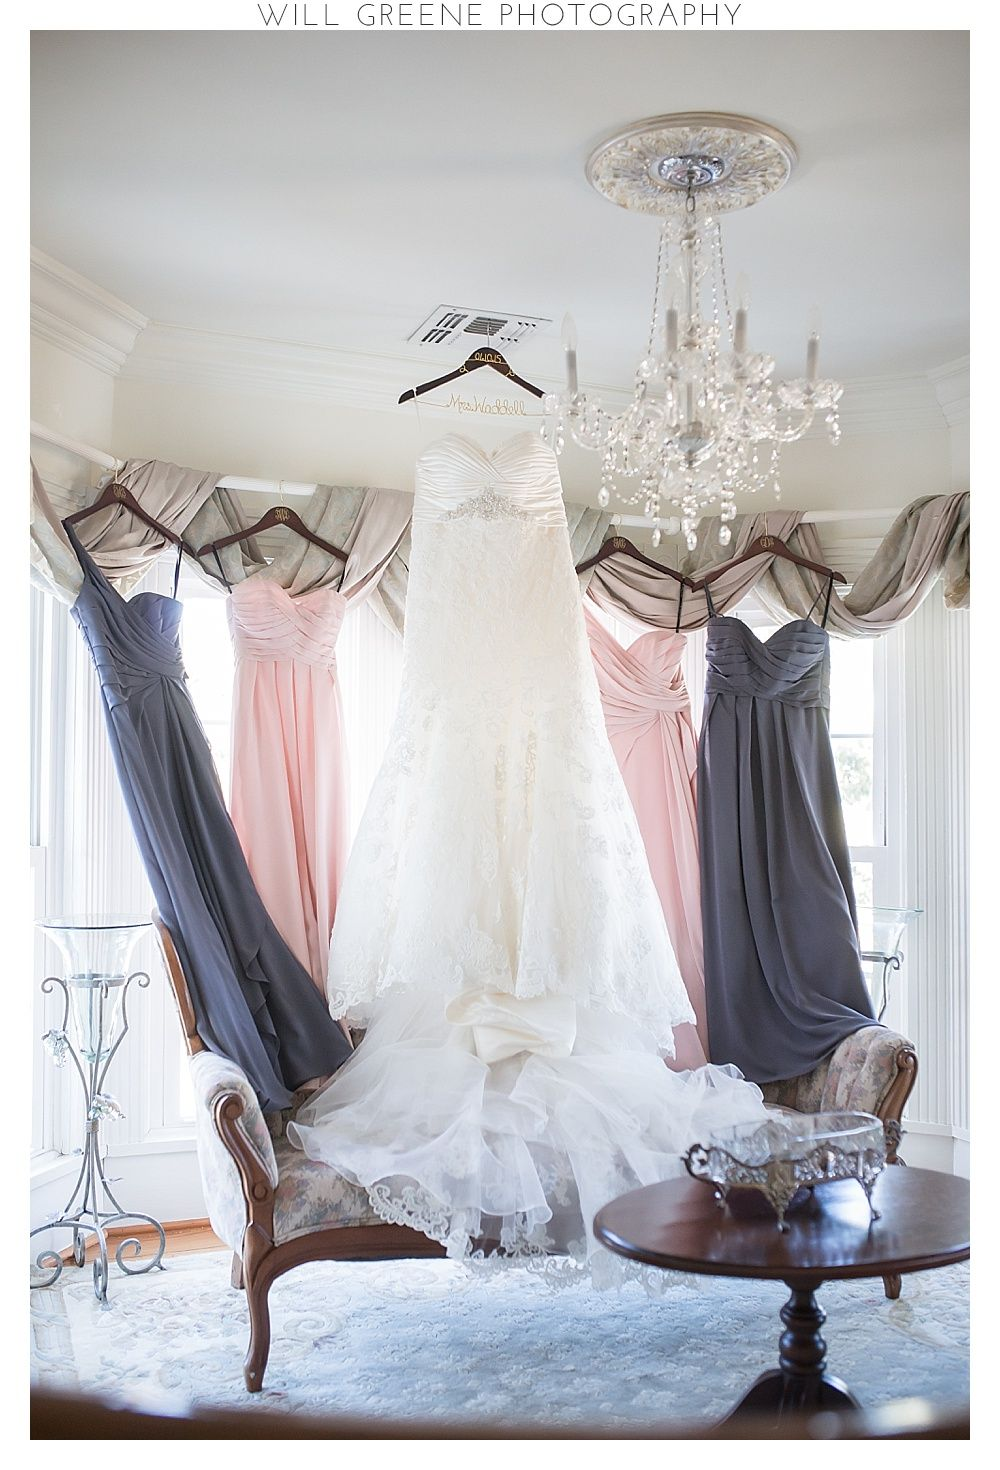 Yankee Hall Plantation Wedding Greenville Nc Will Greene Photography